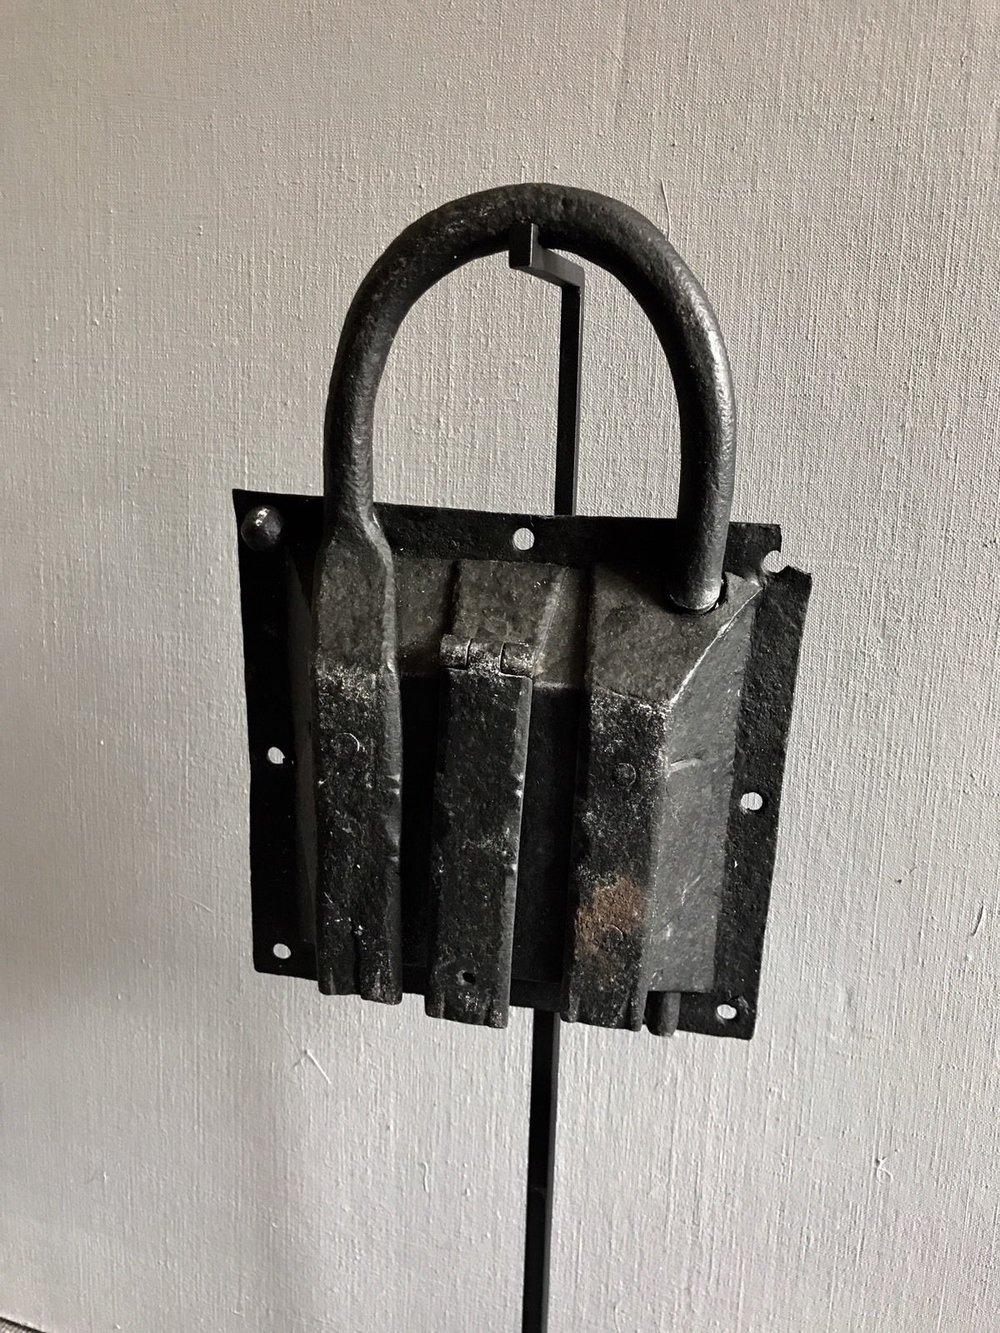 teremok_antiques_medieval_padlock_7.jpg